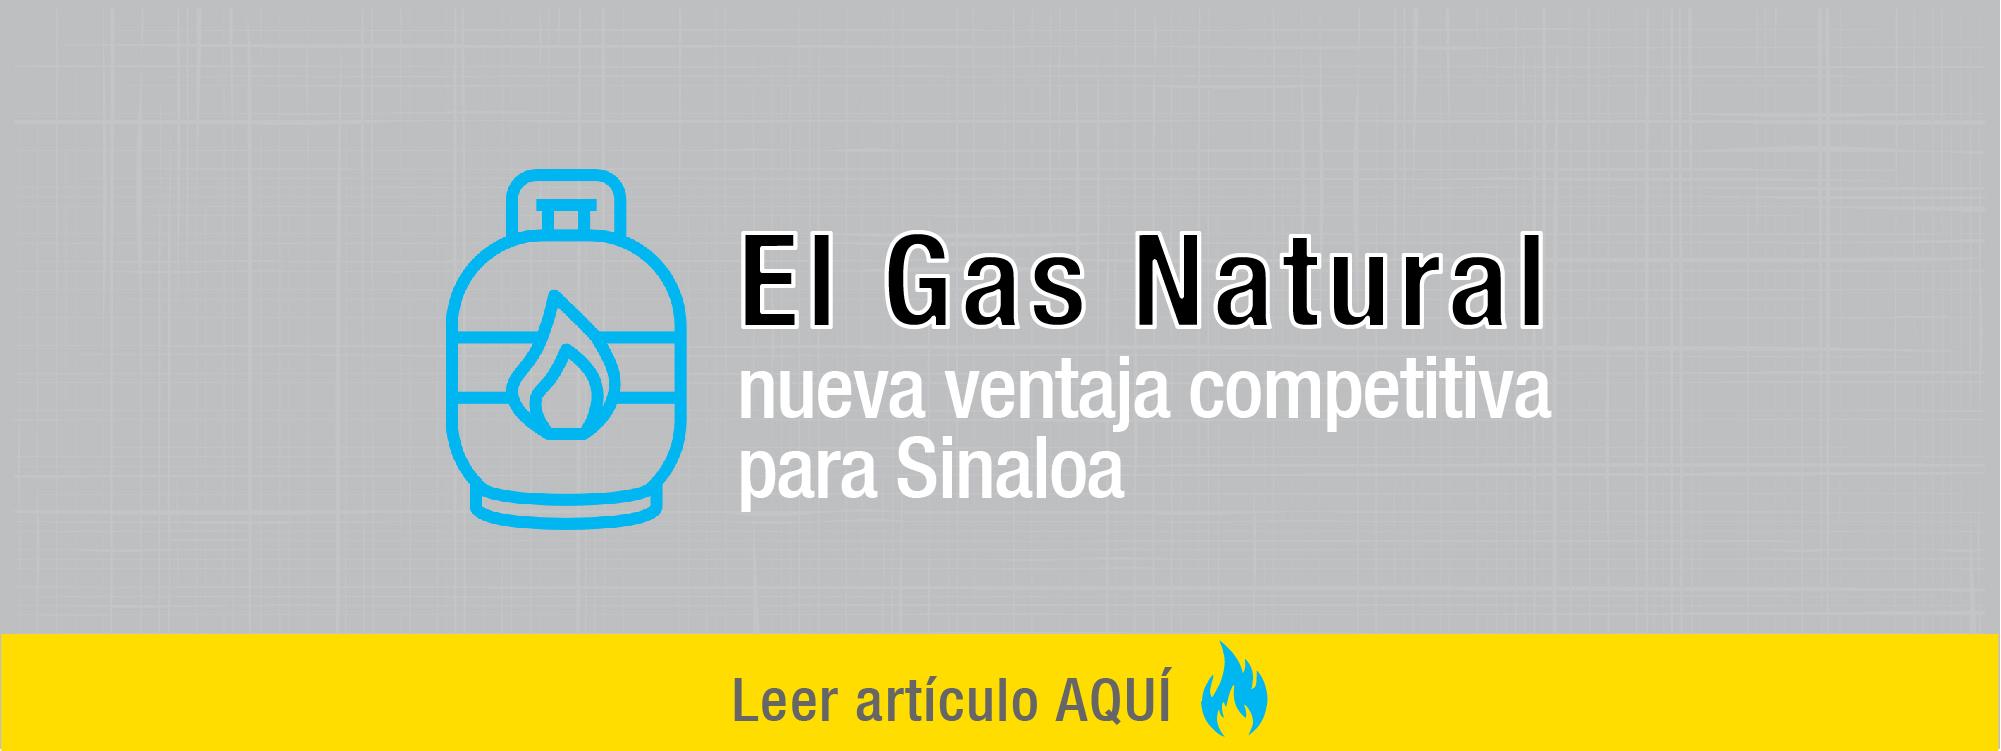 portada-GAS-NAtural-01